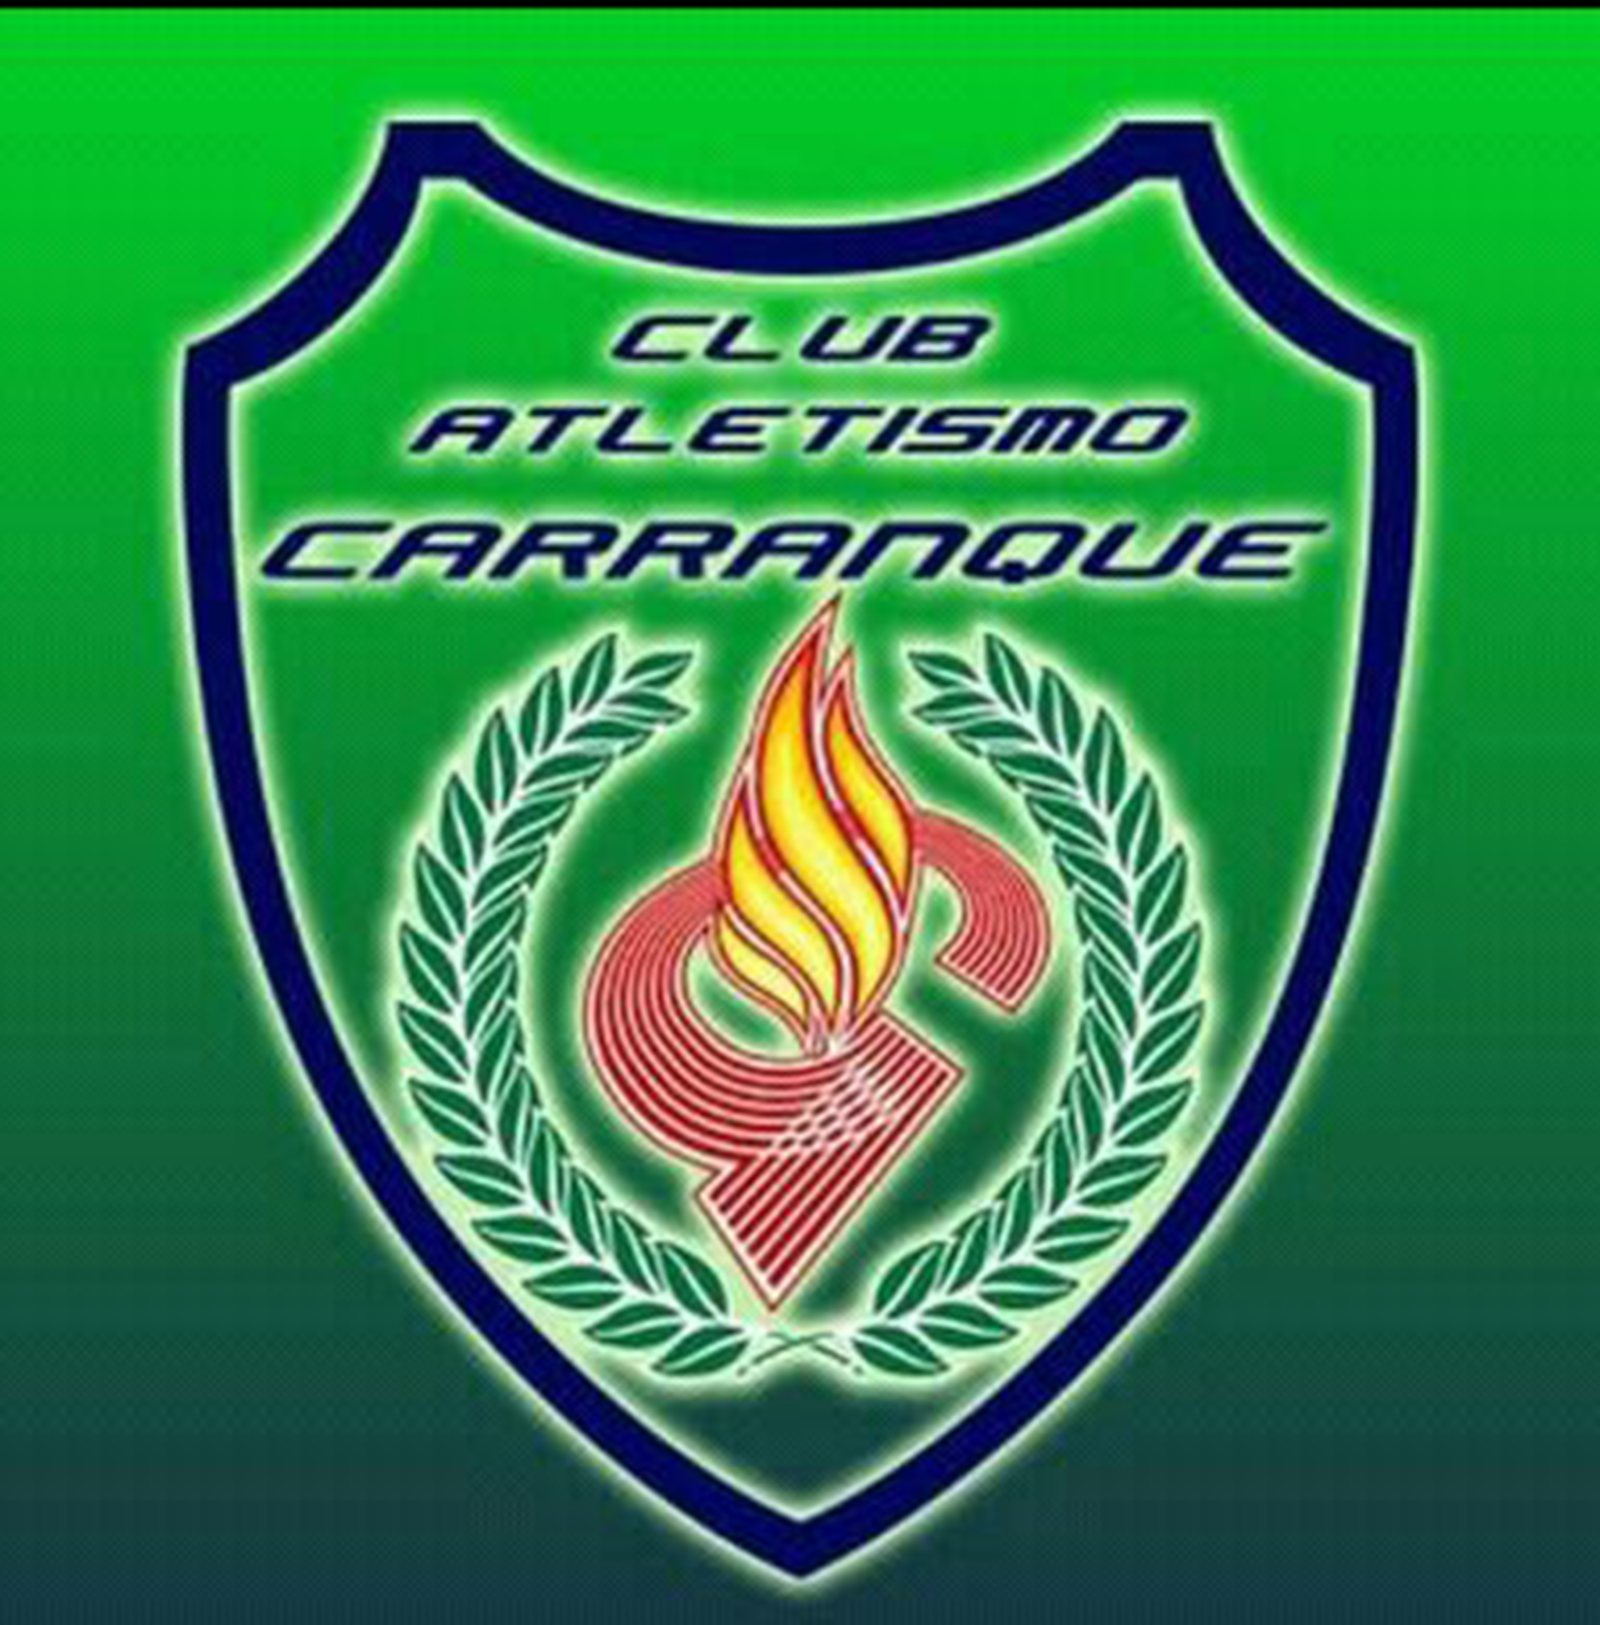 Club Atletismo Carranque